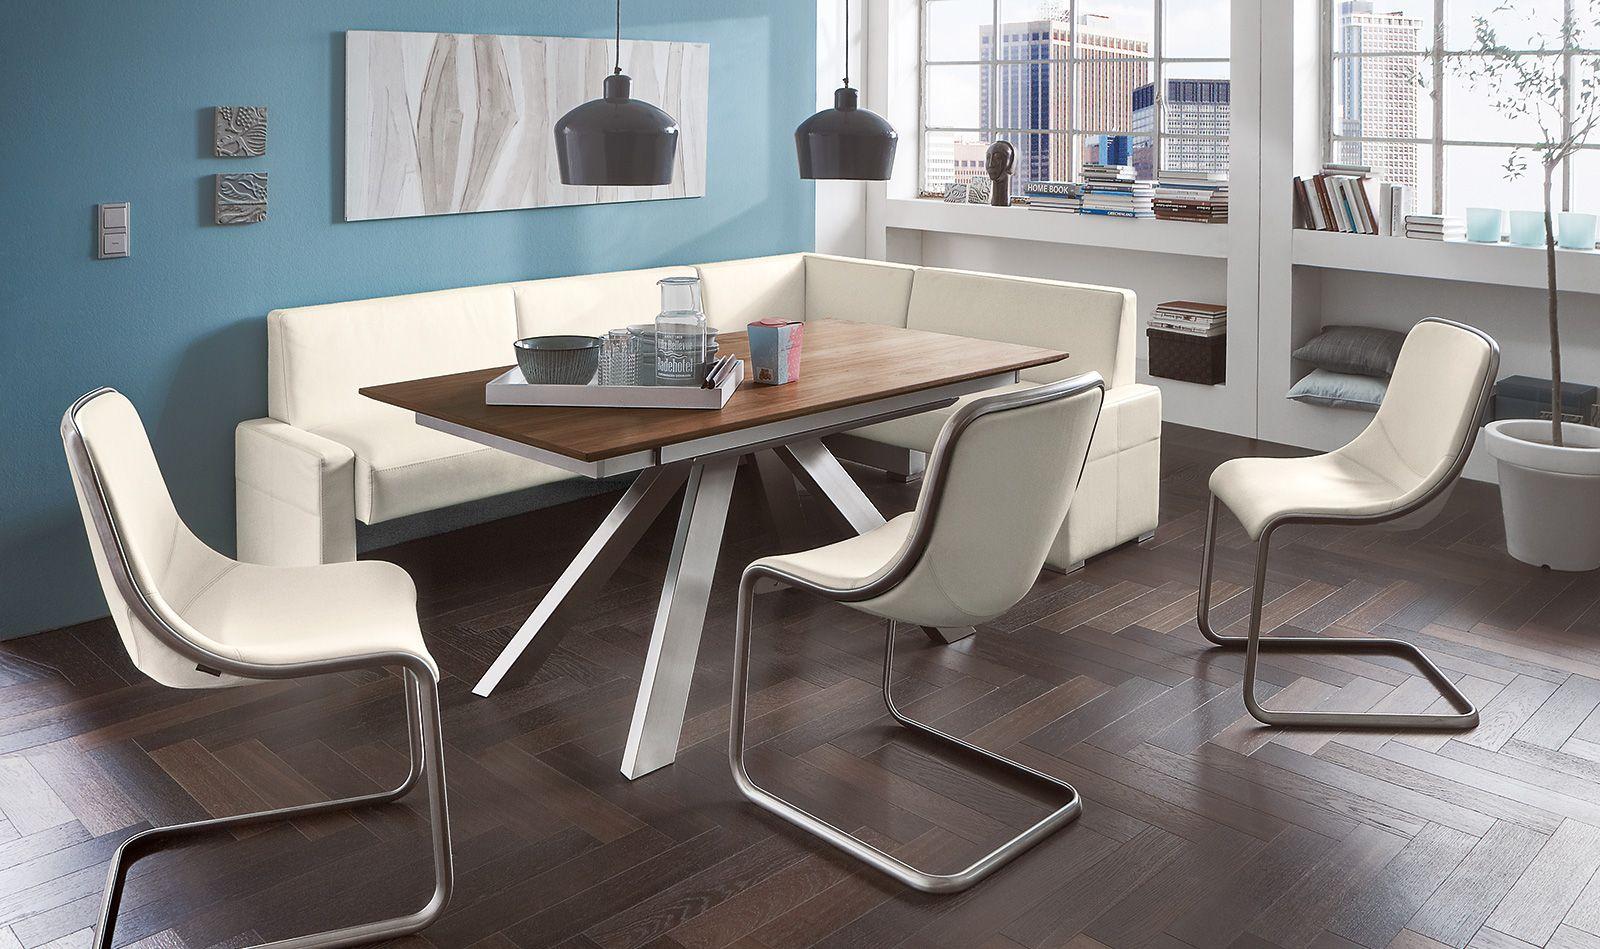 impuls programme esszimmer venjakob m bel ideen rund ums wohnen pinterest venjakob. Black Bedroom Furniture Sets. Home Design Ideas